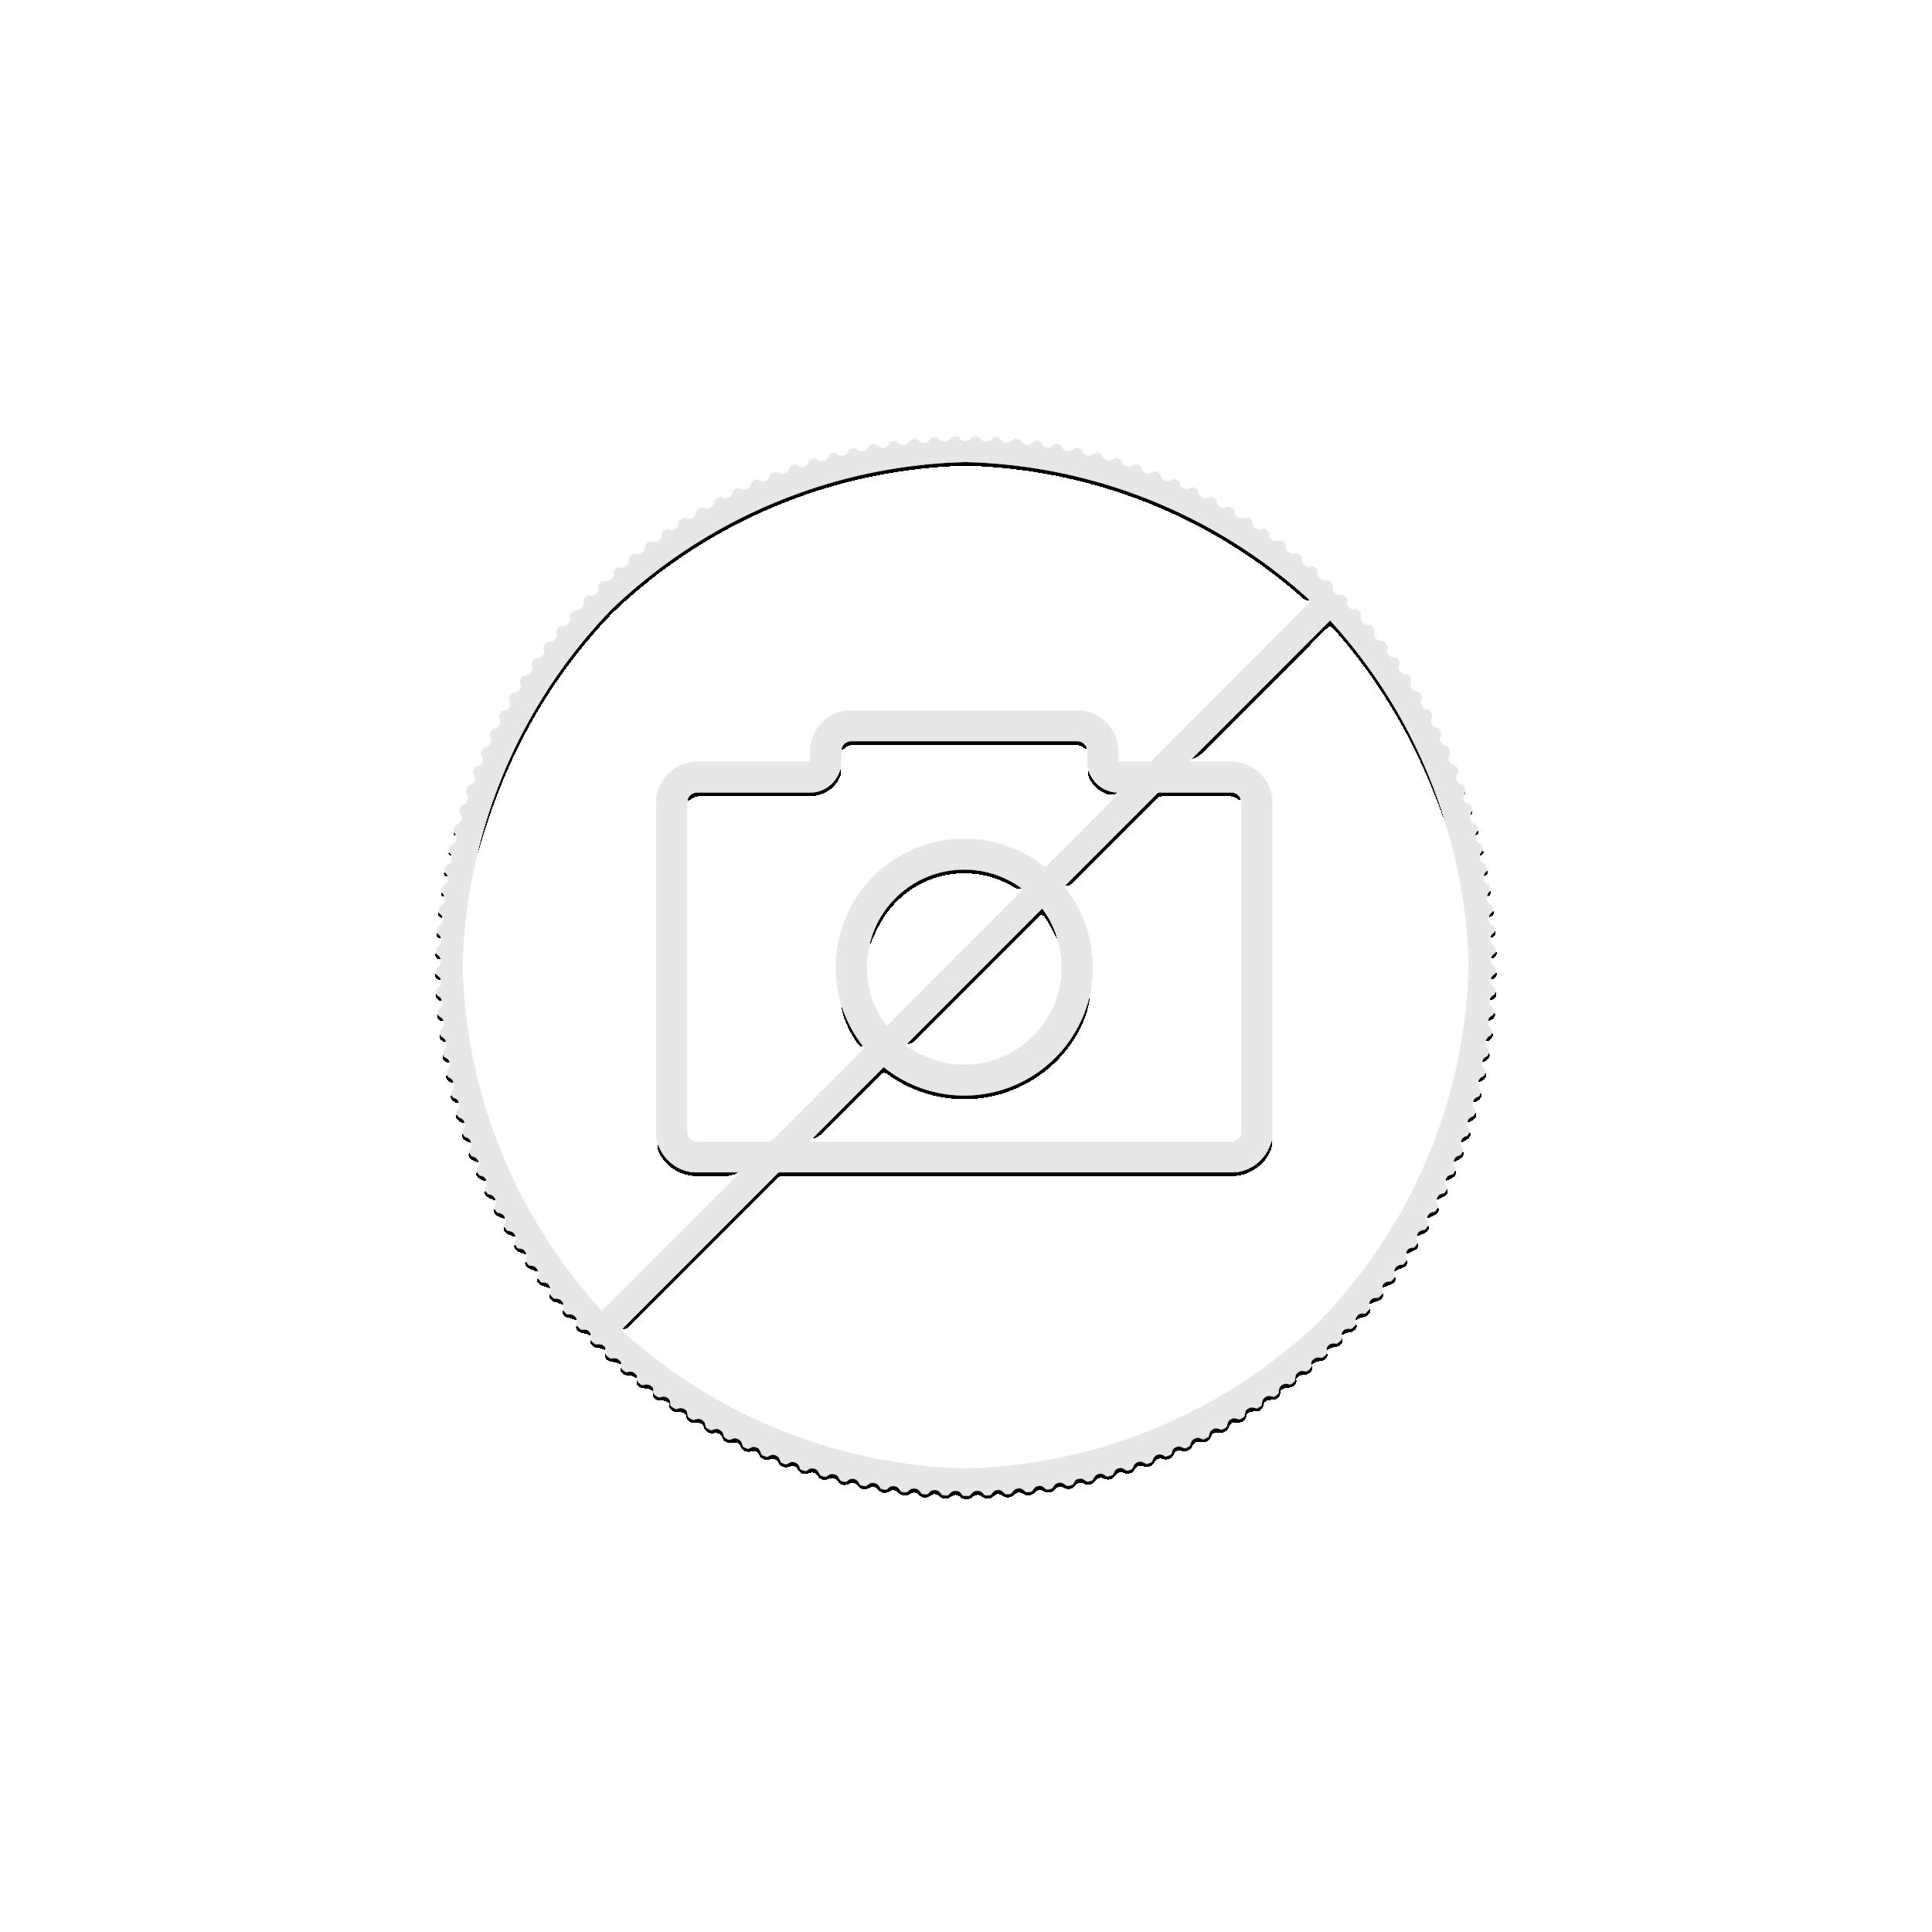 1 Troy ounce zilveren munt Nugget - Welcome Stranger 2019 achterzijde